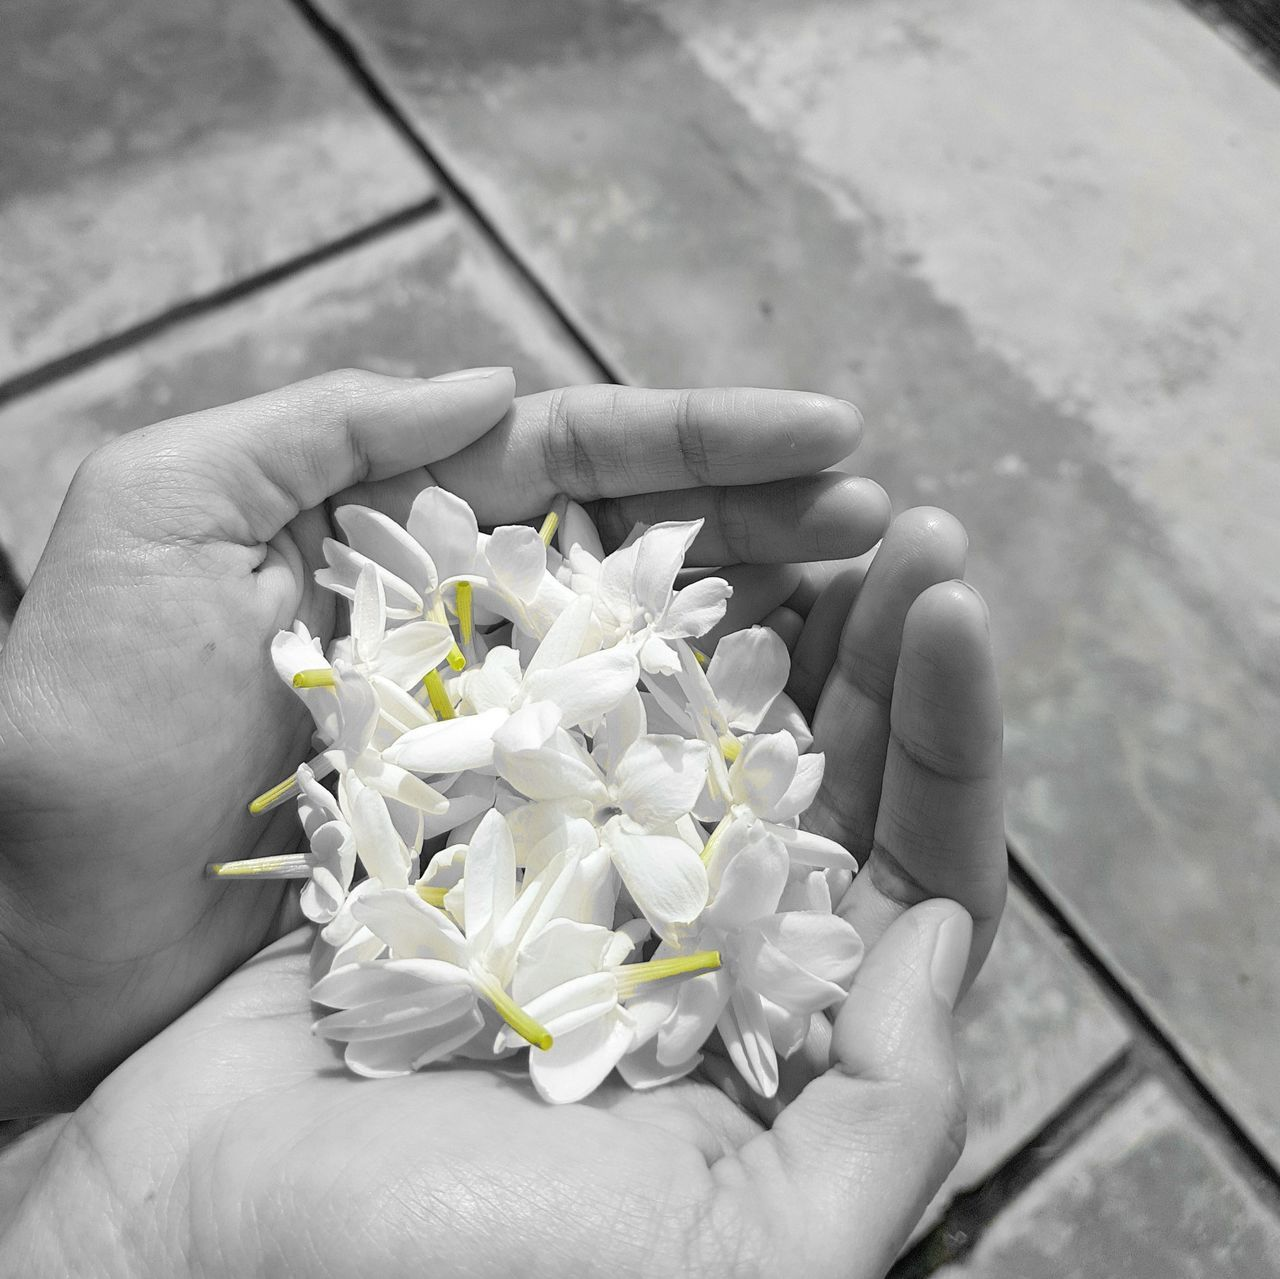 Jasmine in wife hand 😍 Nature Flower S7 Edge Photography Samsung Galaxy S7 Edge Freshness Nature Flower_Collection Flower Photography Flowers,Plants & Garden Black & White Photography Black & White Black&white Black And White With A Splash Of Colour Jasmine Flower Jasmine Flowers Jasmine